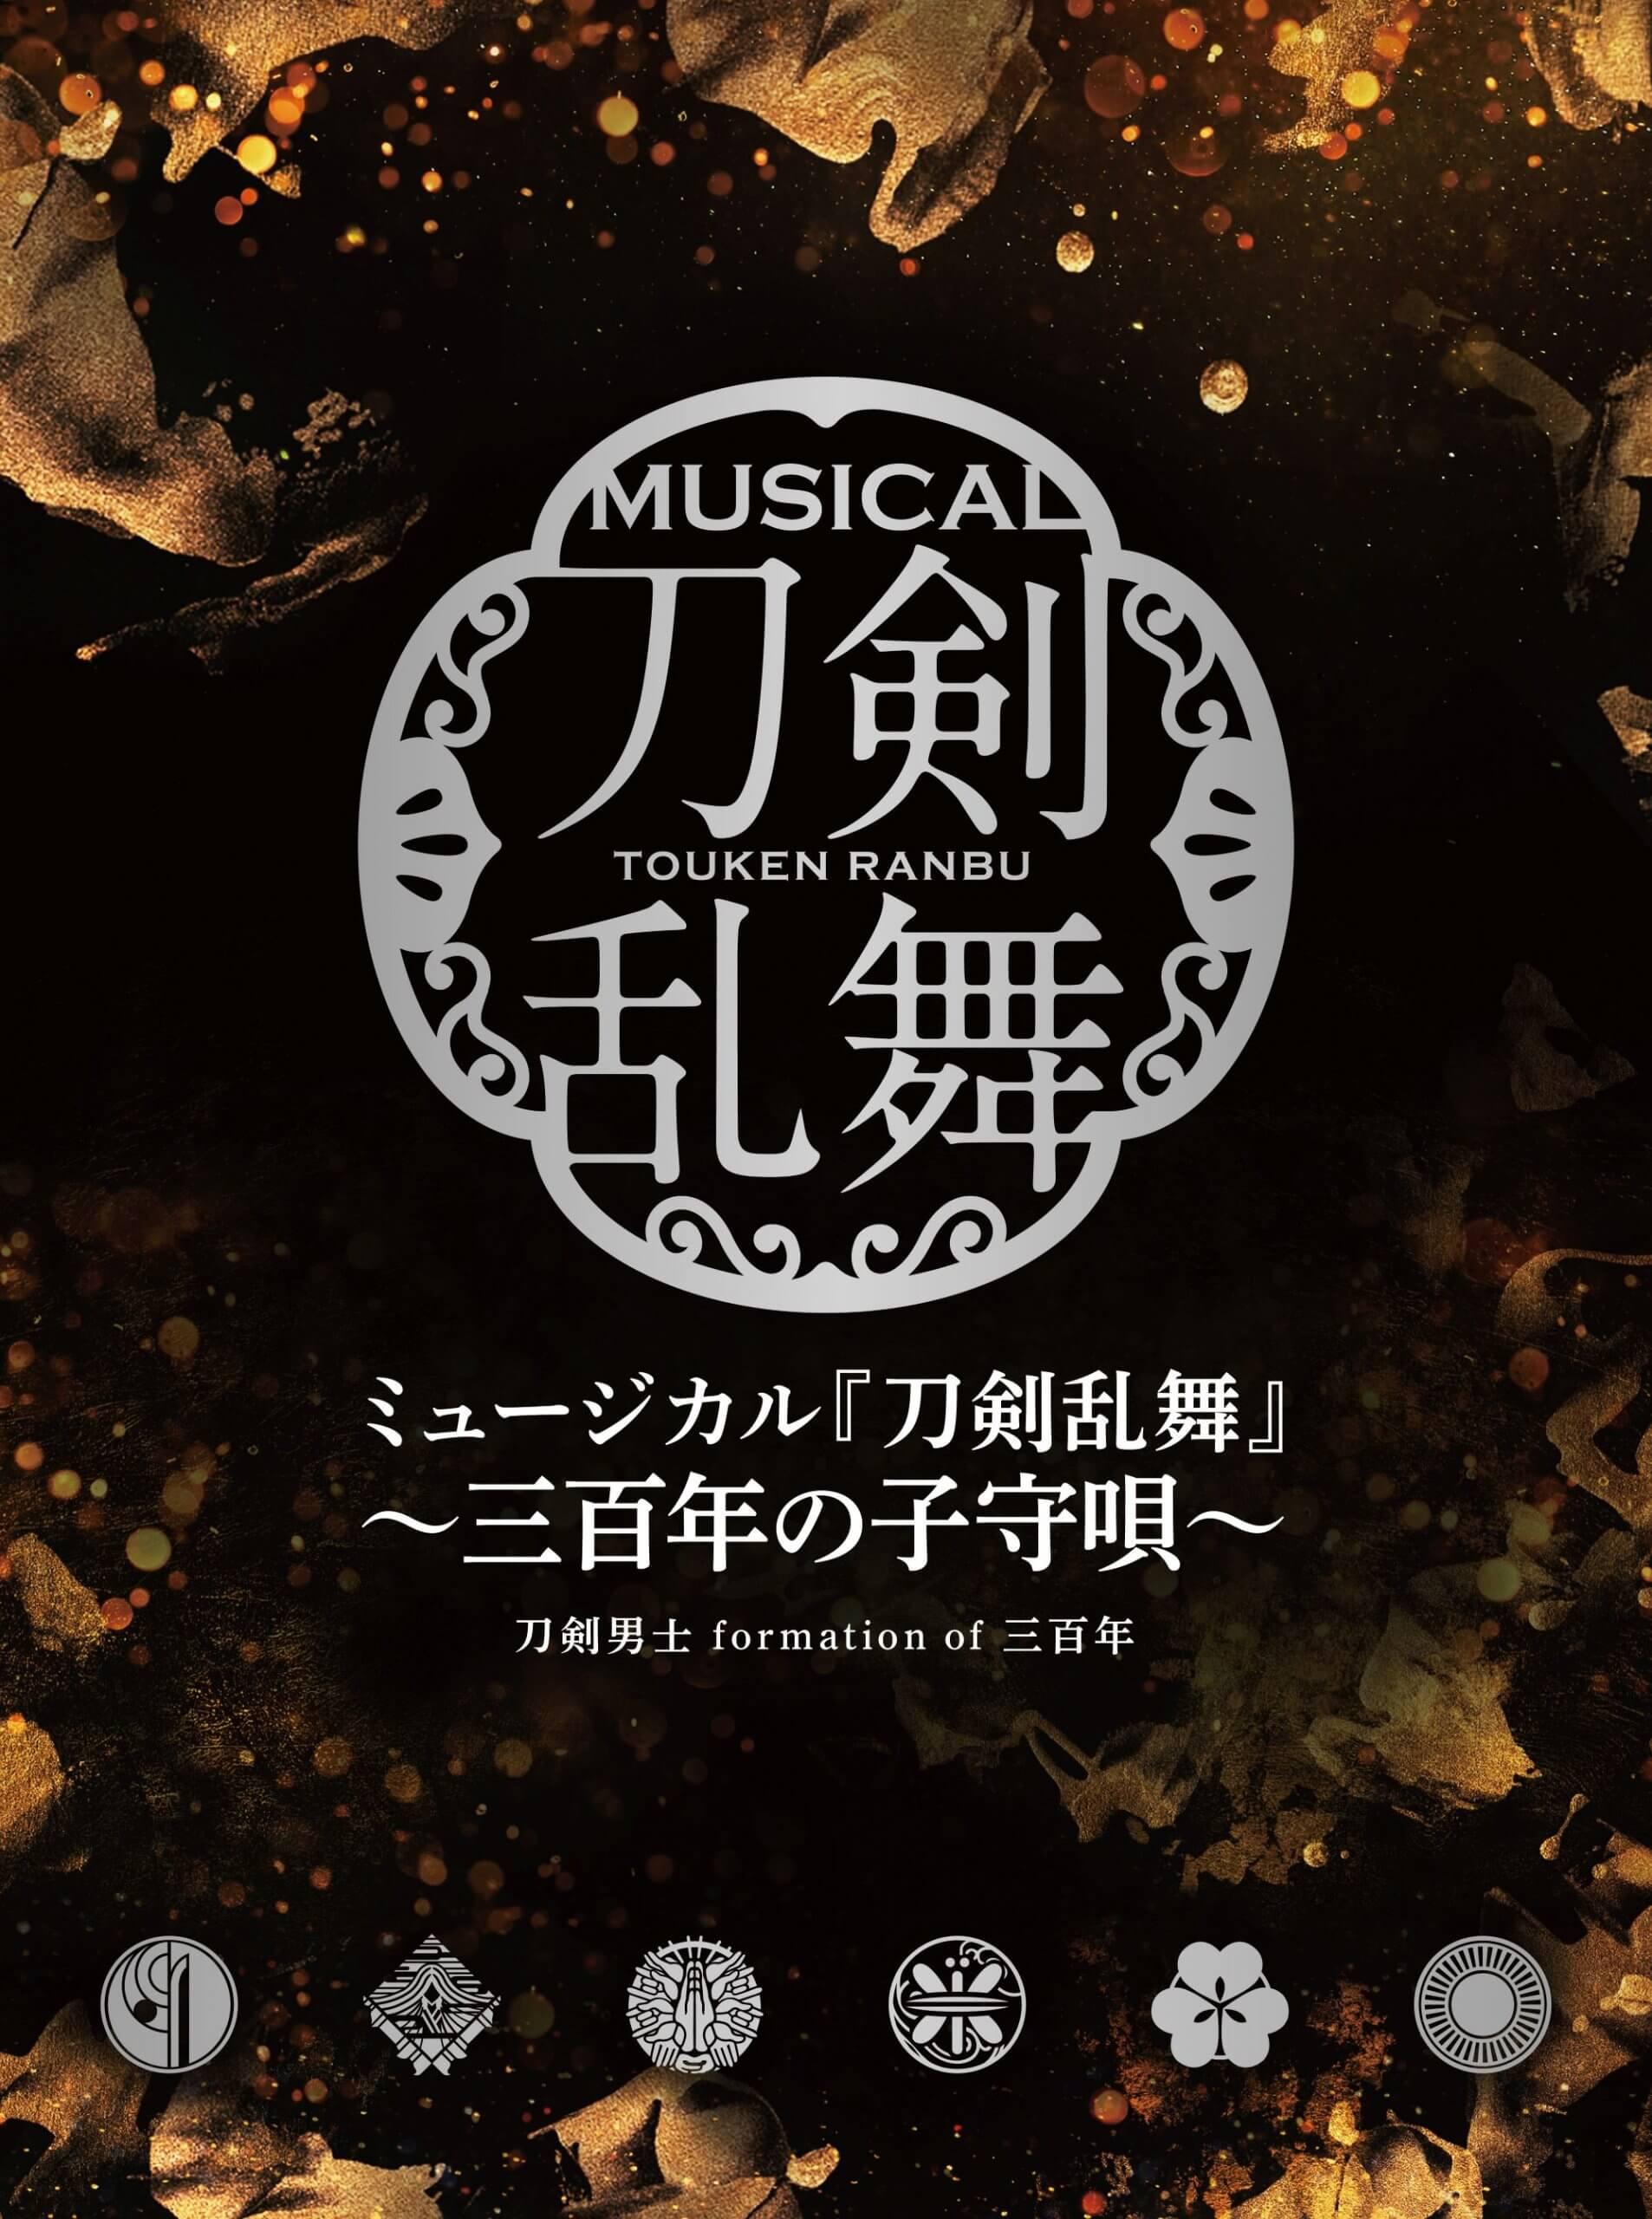 EMPC-60 / ミュージカル『刀剣乱舞』 〜三百年の子守唄〜[初回限定盤B] / 刀剣男士 formation of 三百年 / CD